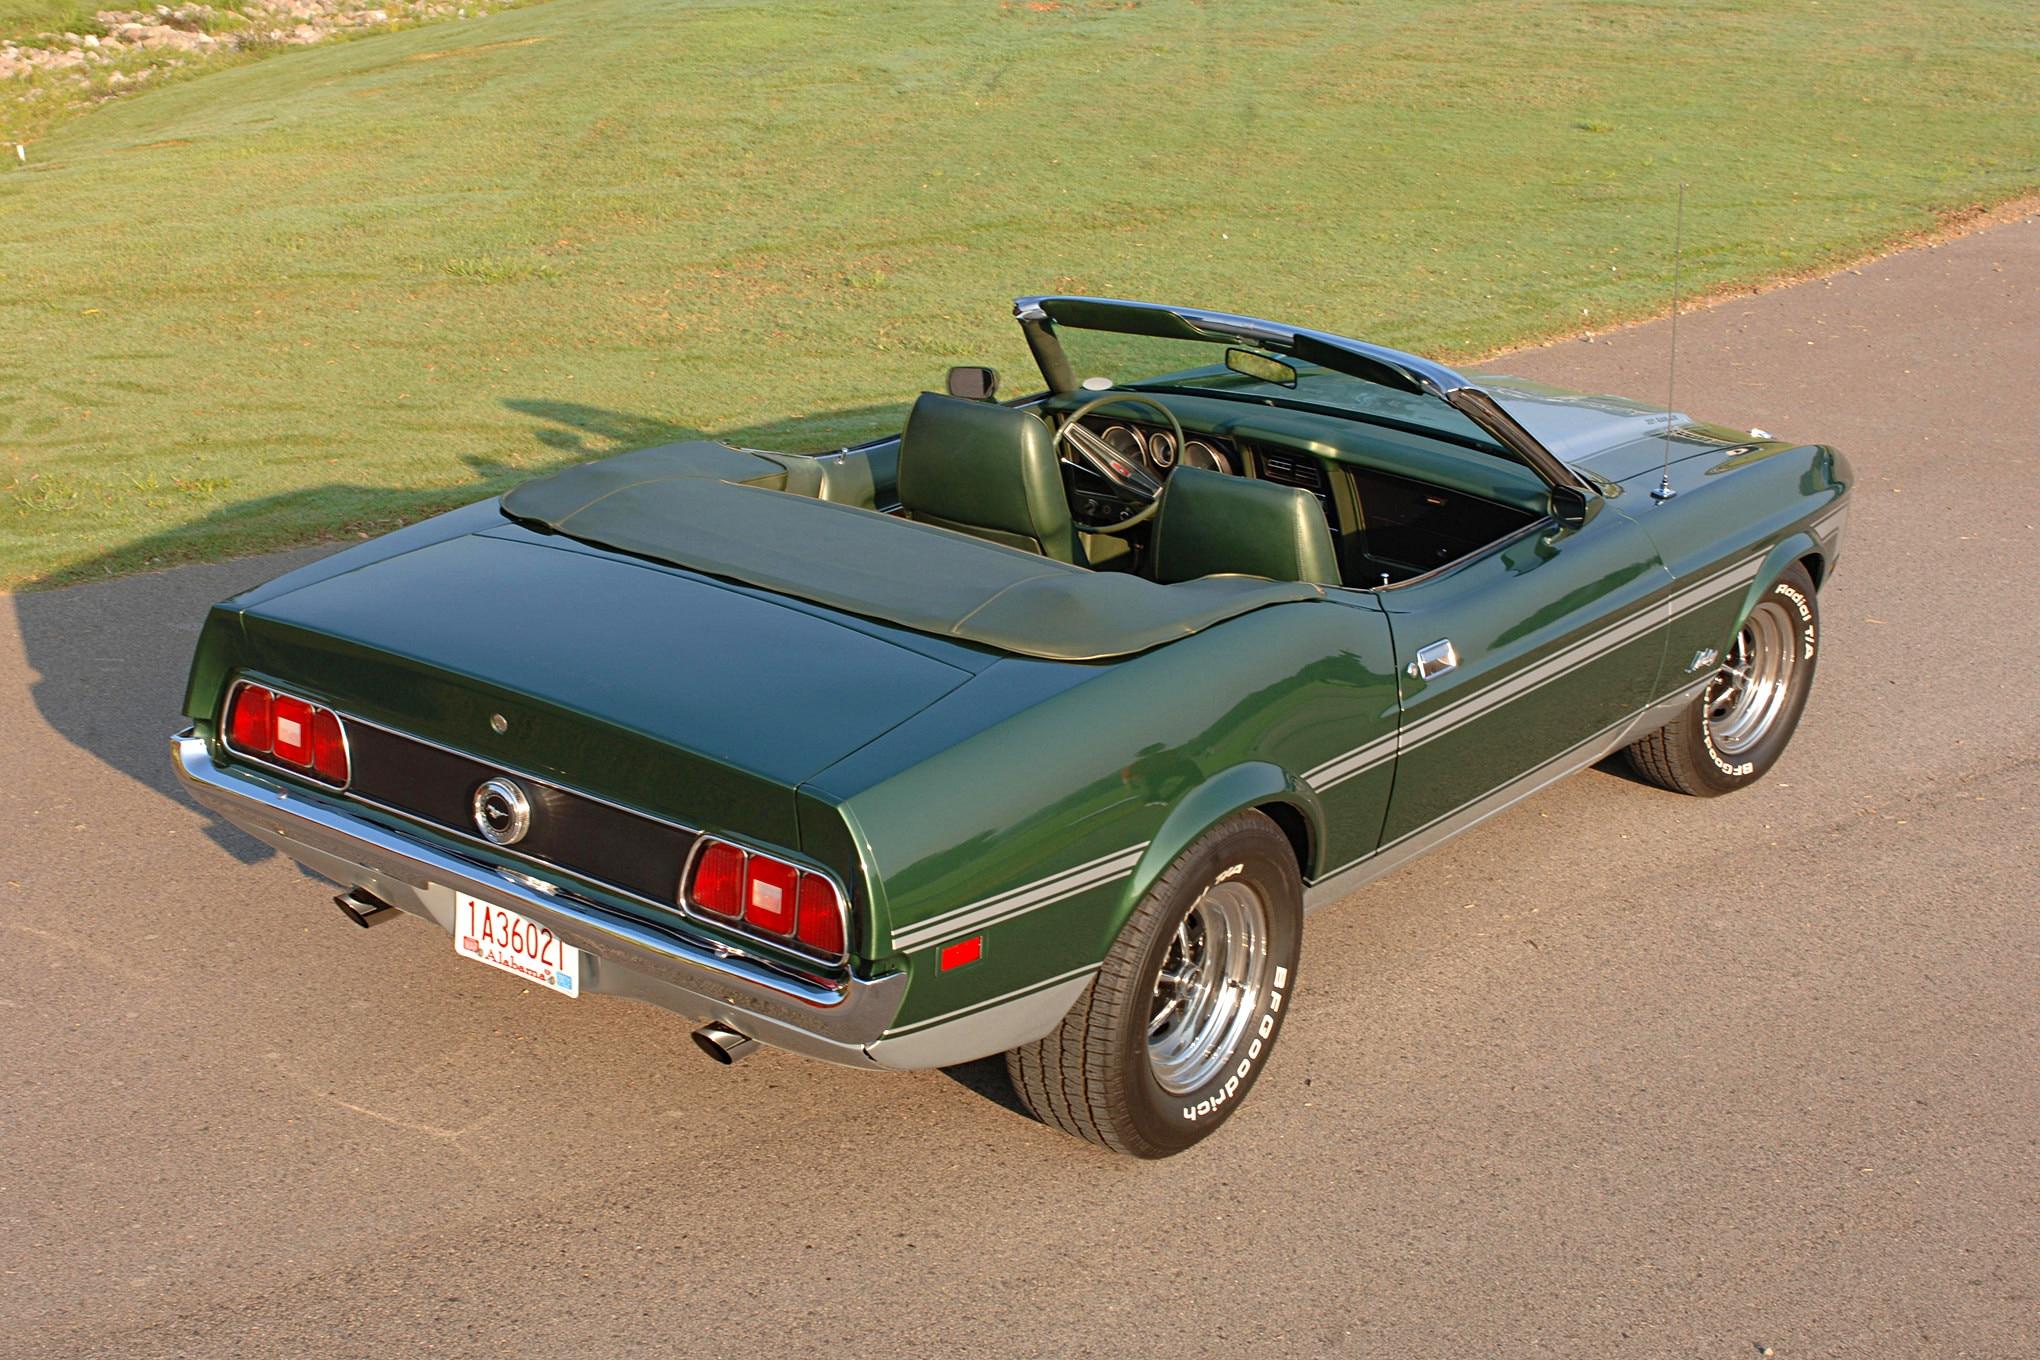 023 1971 73 Mustang SpottersGuide Heasley